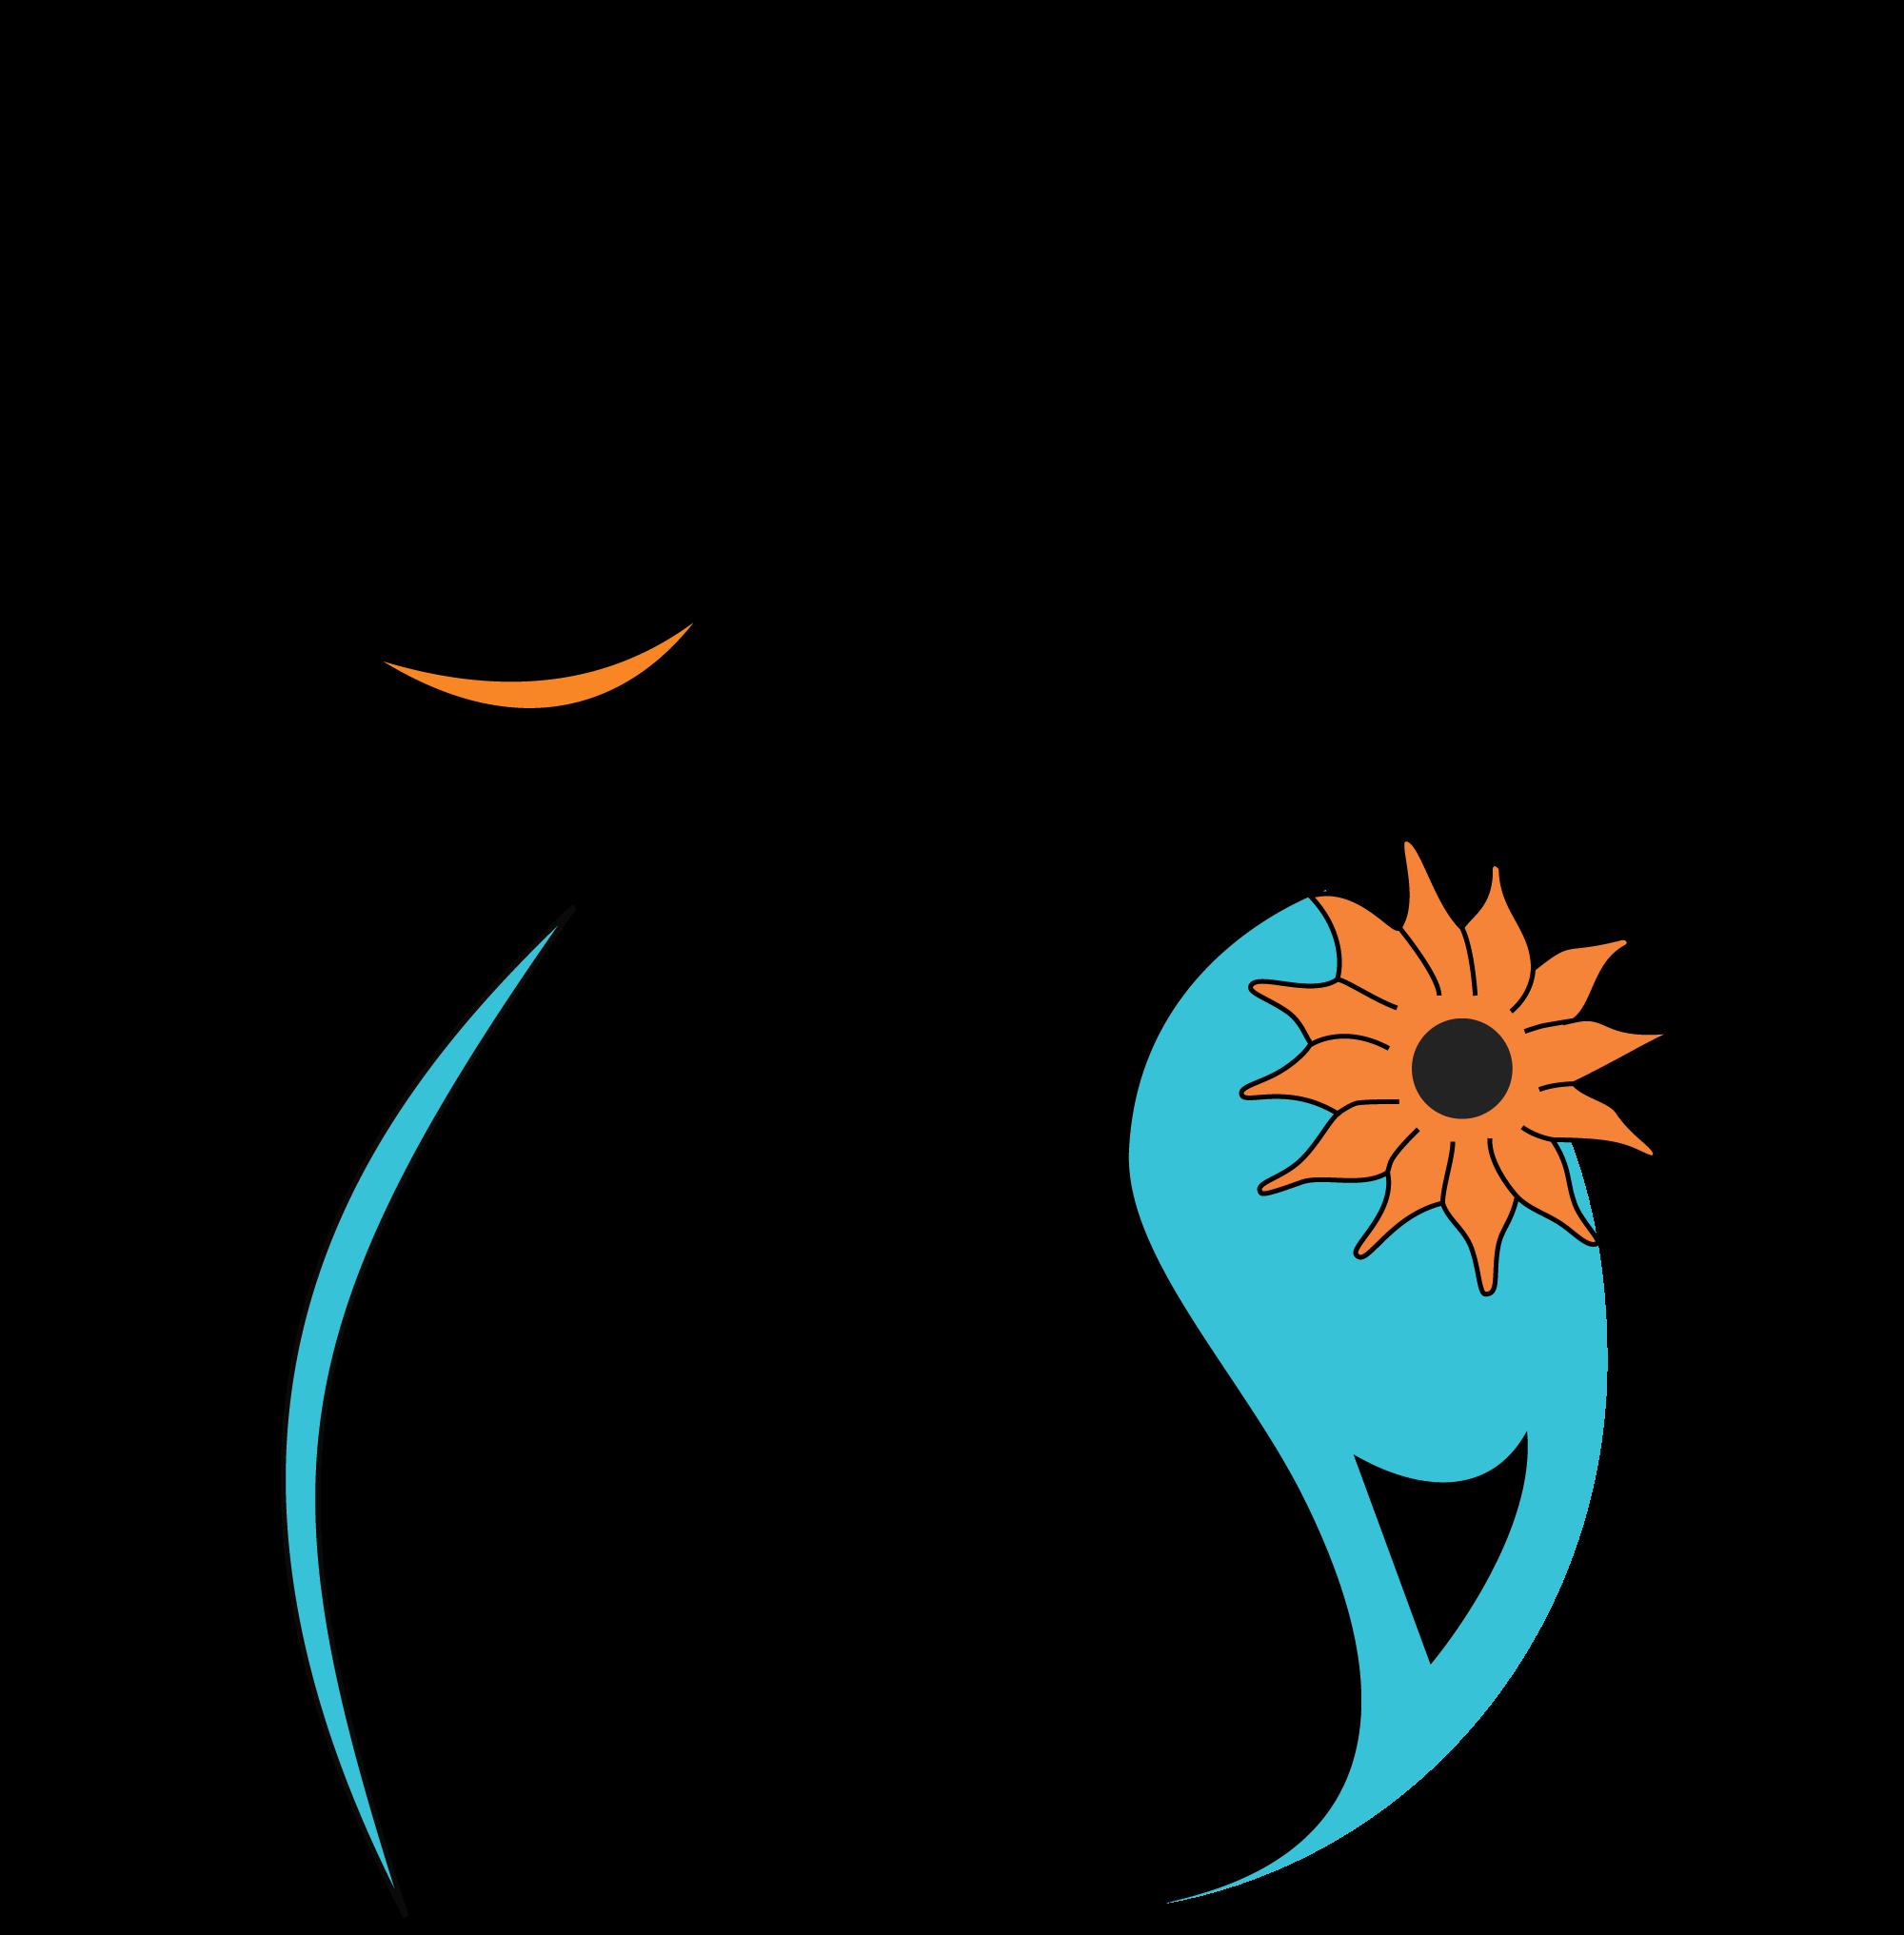 logo turquoisedomes com - شرکت توریستی TurquoiseDomes